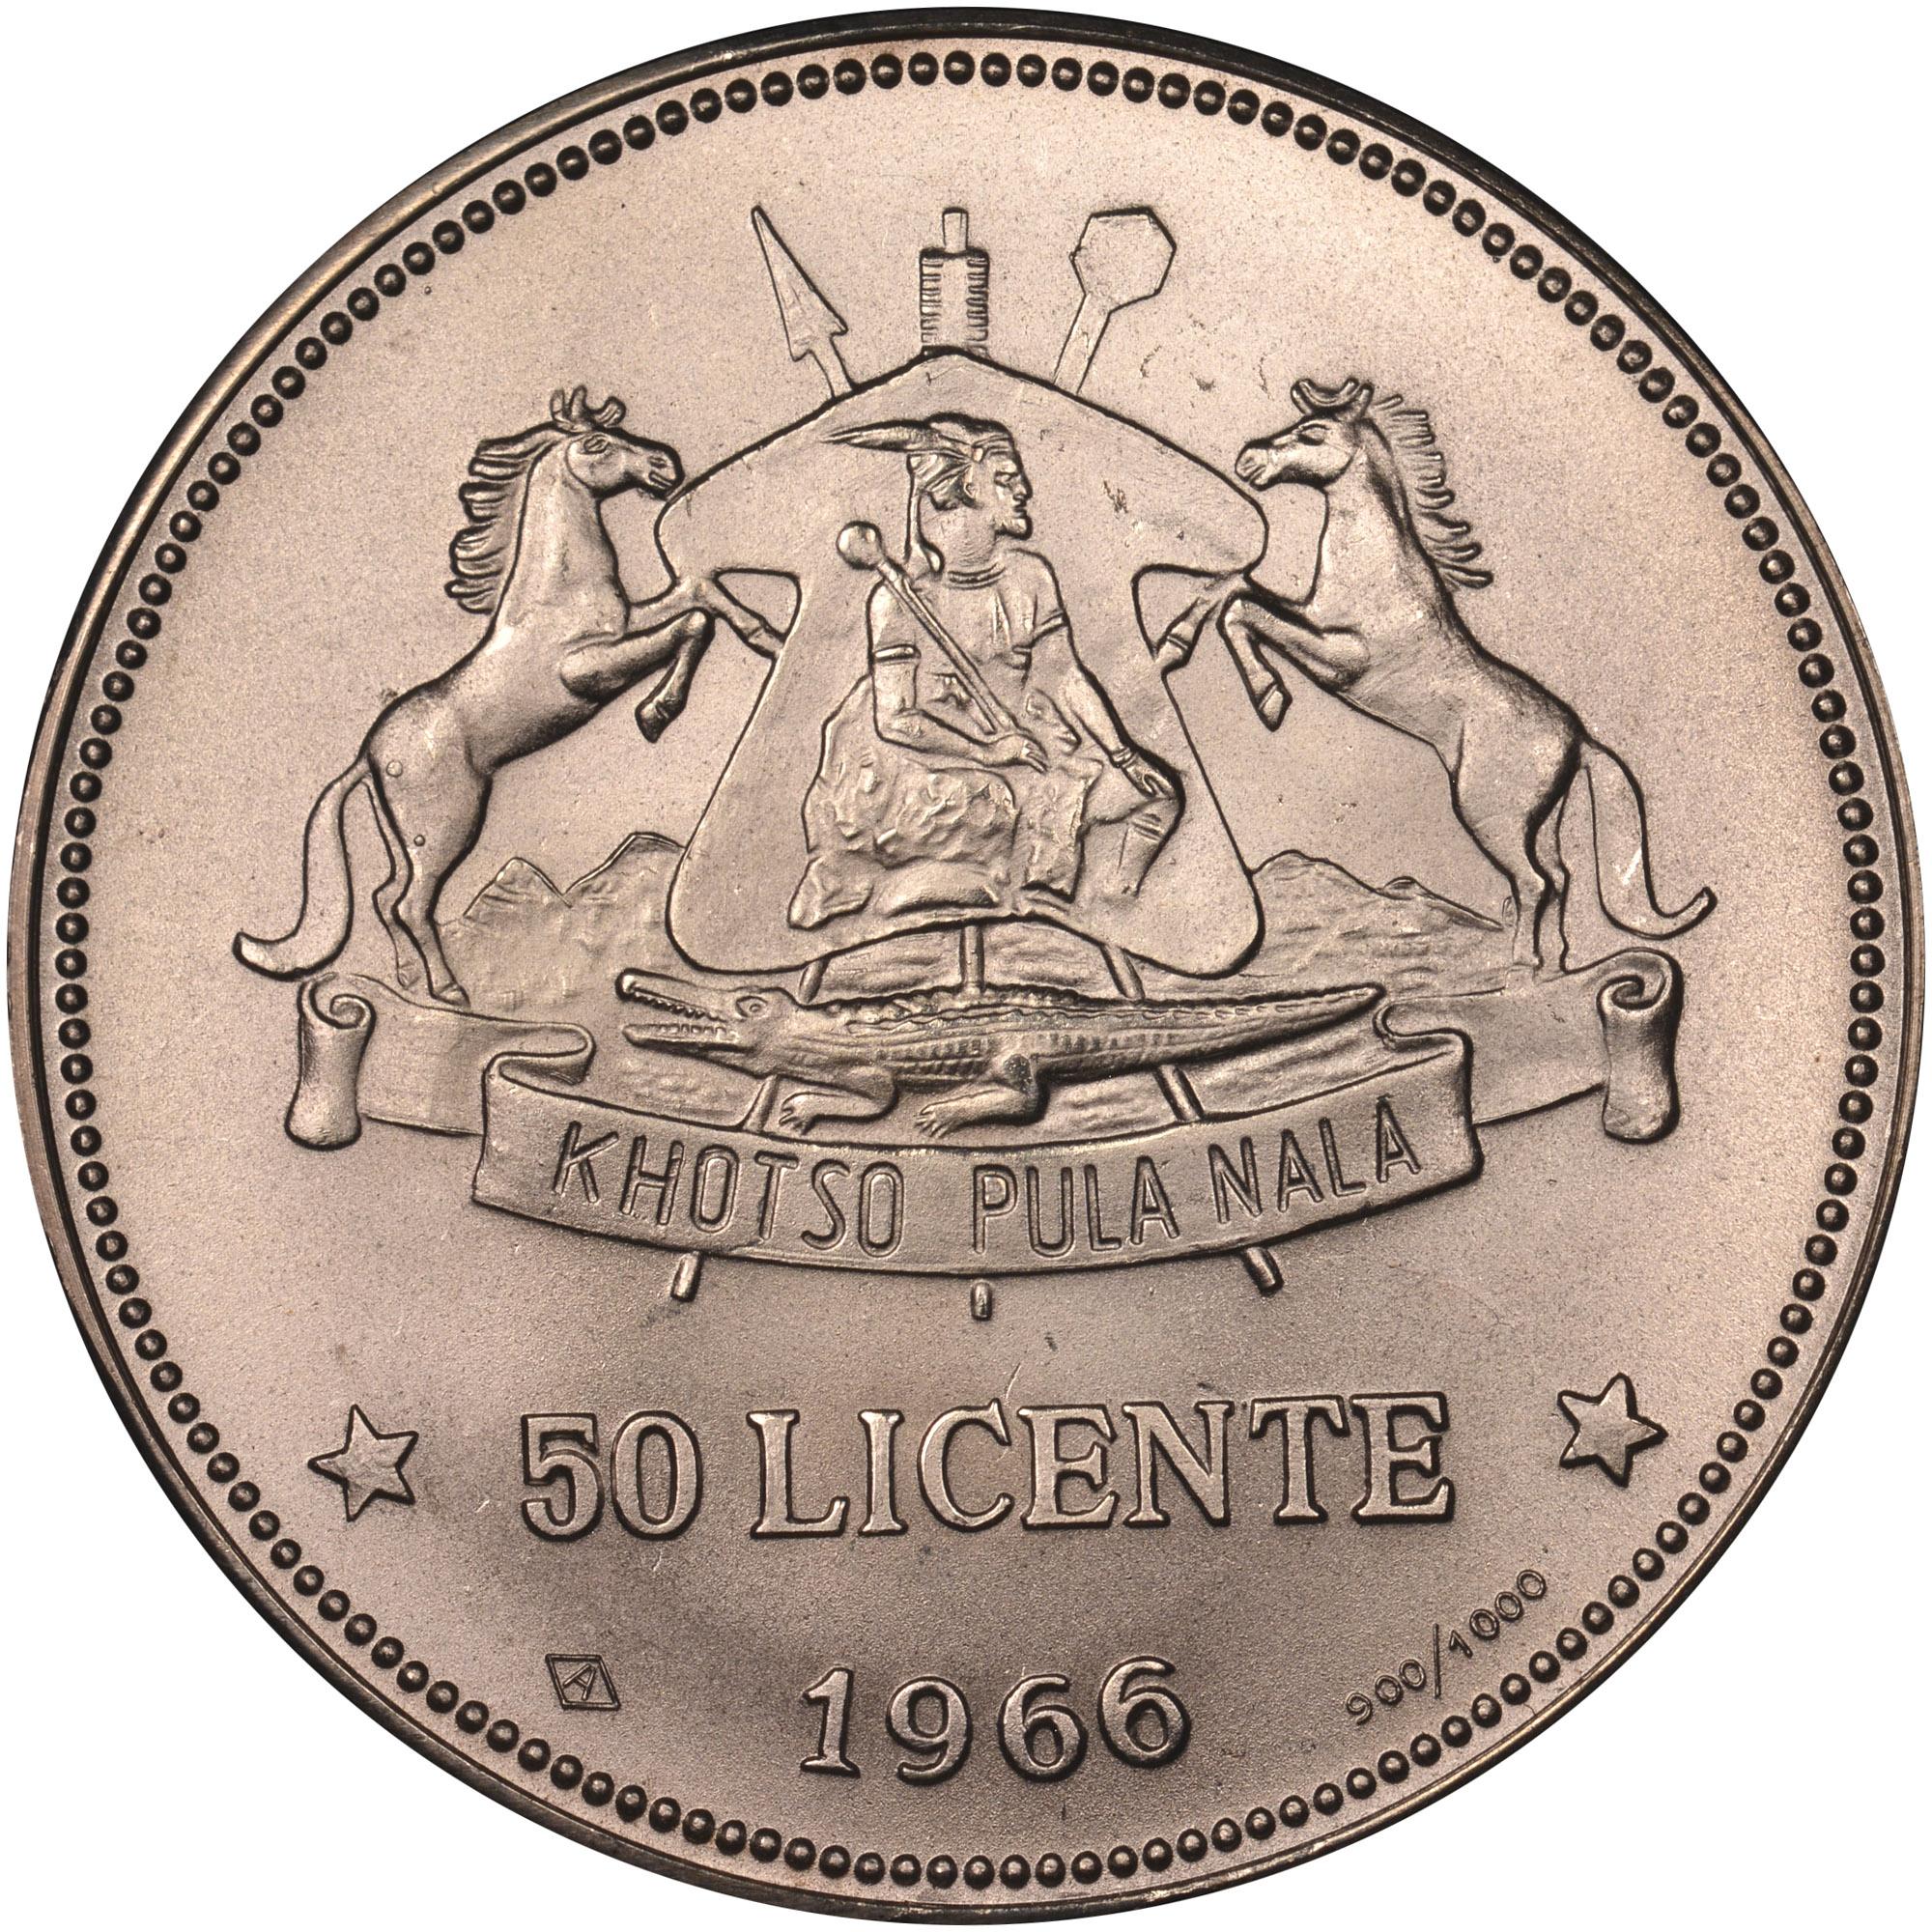 Lesotho 50 Licente reverse